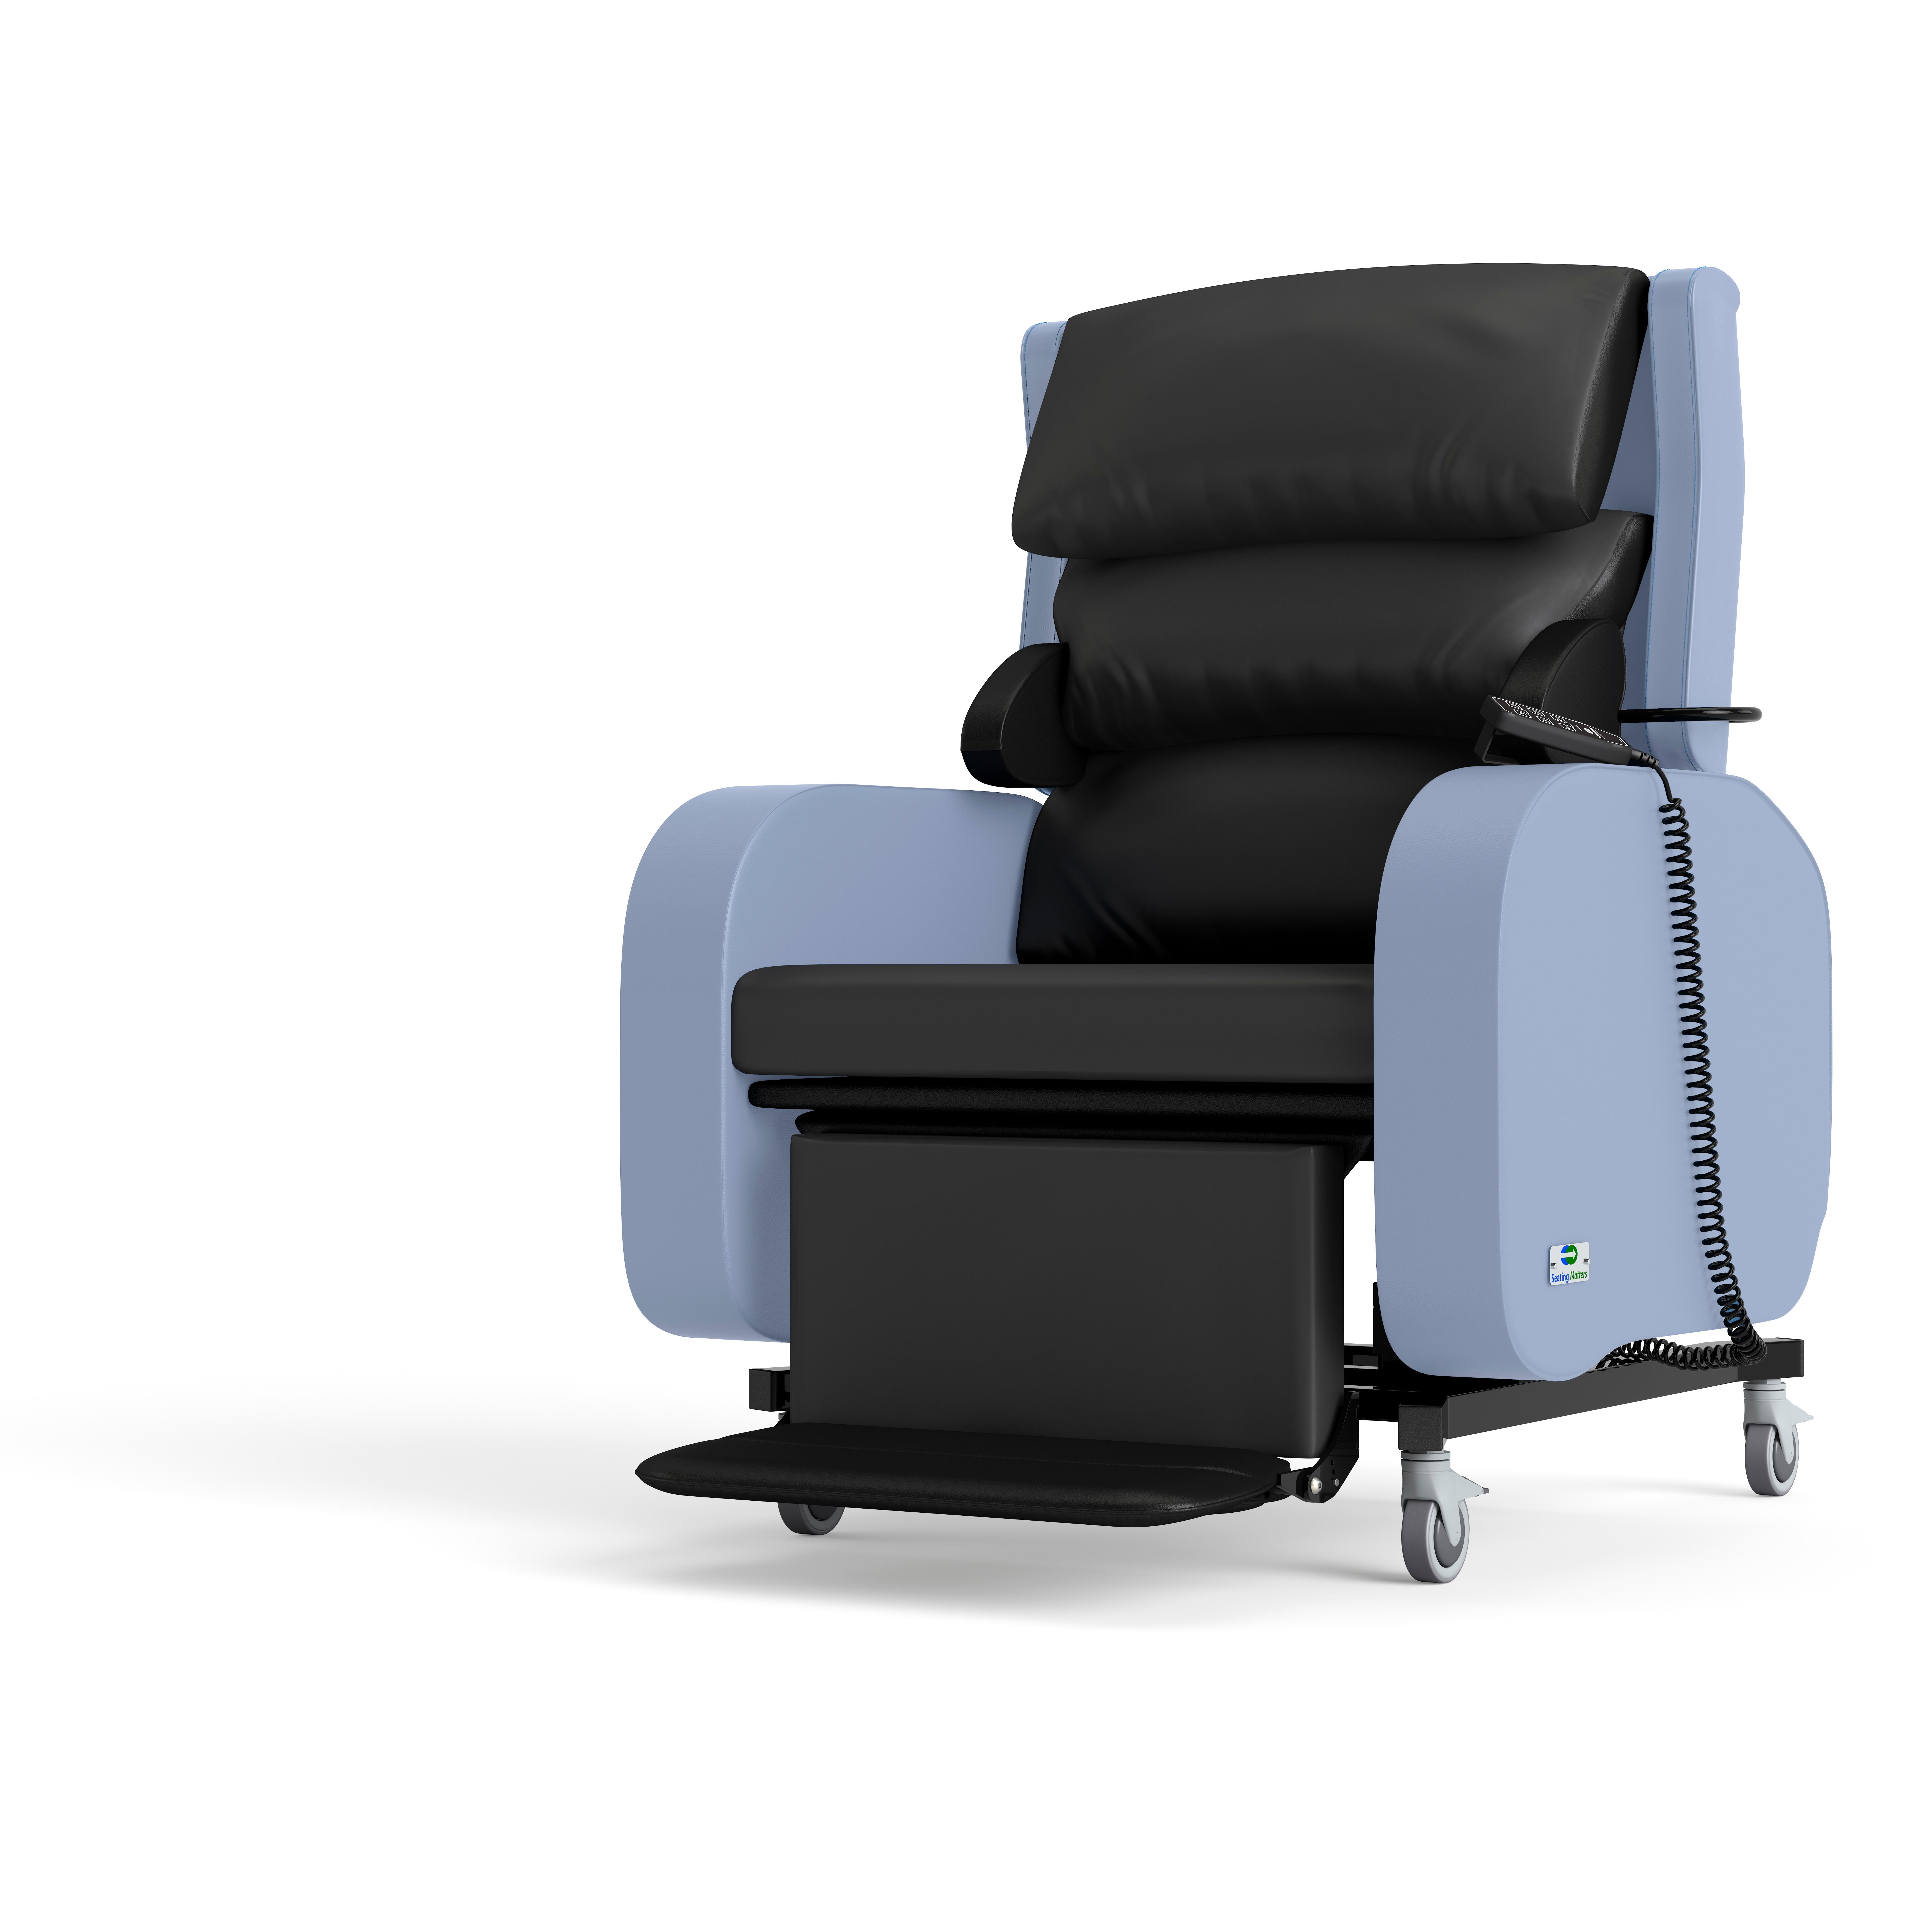 Seating_Matters_Bariatric_Sorrento.jpg